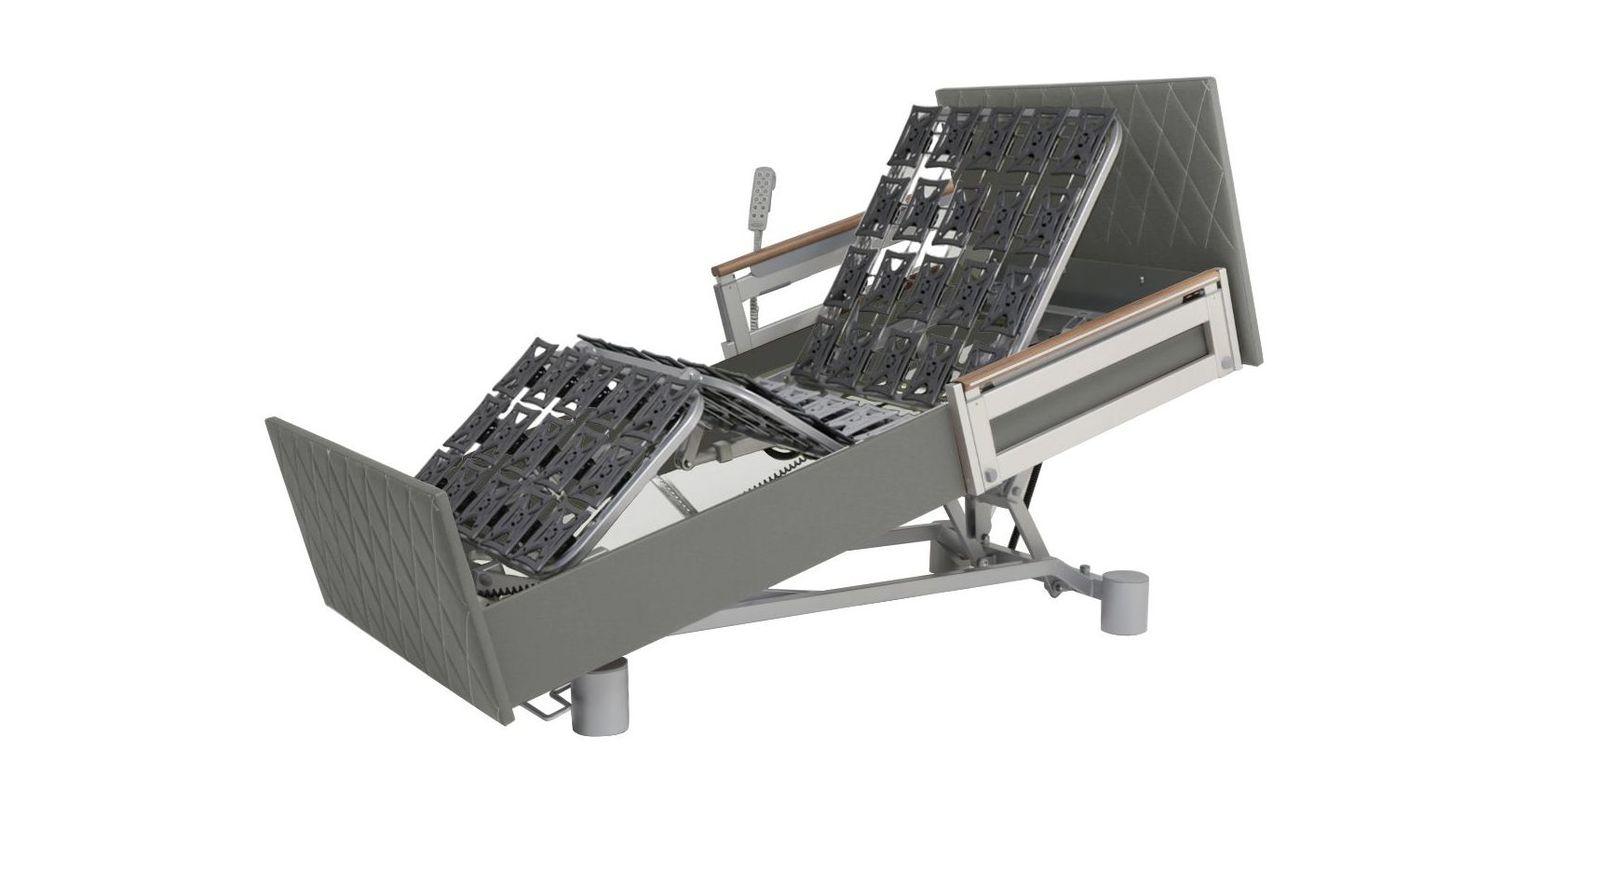 Komfortbett mit Pflegebett-Funktion in Sessel-Position